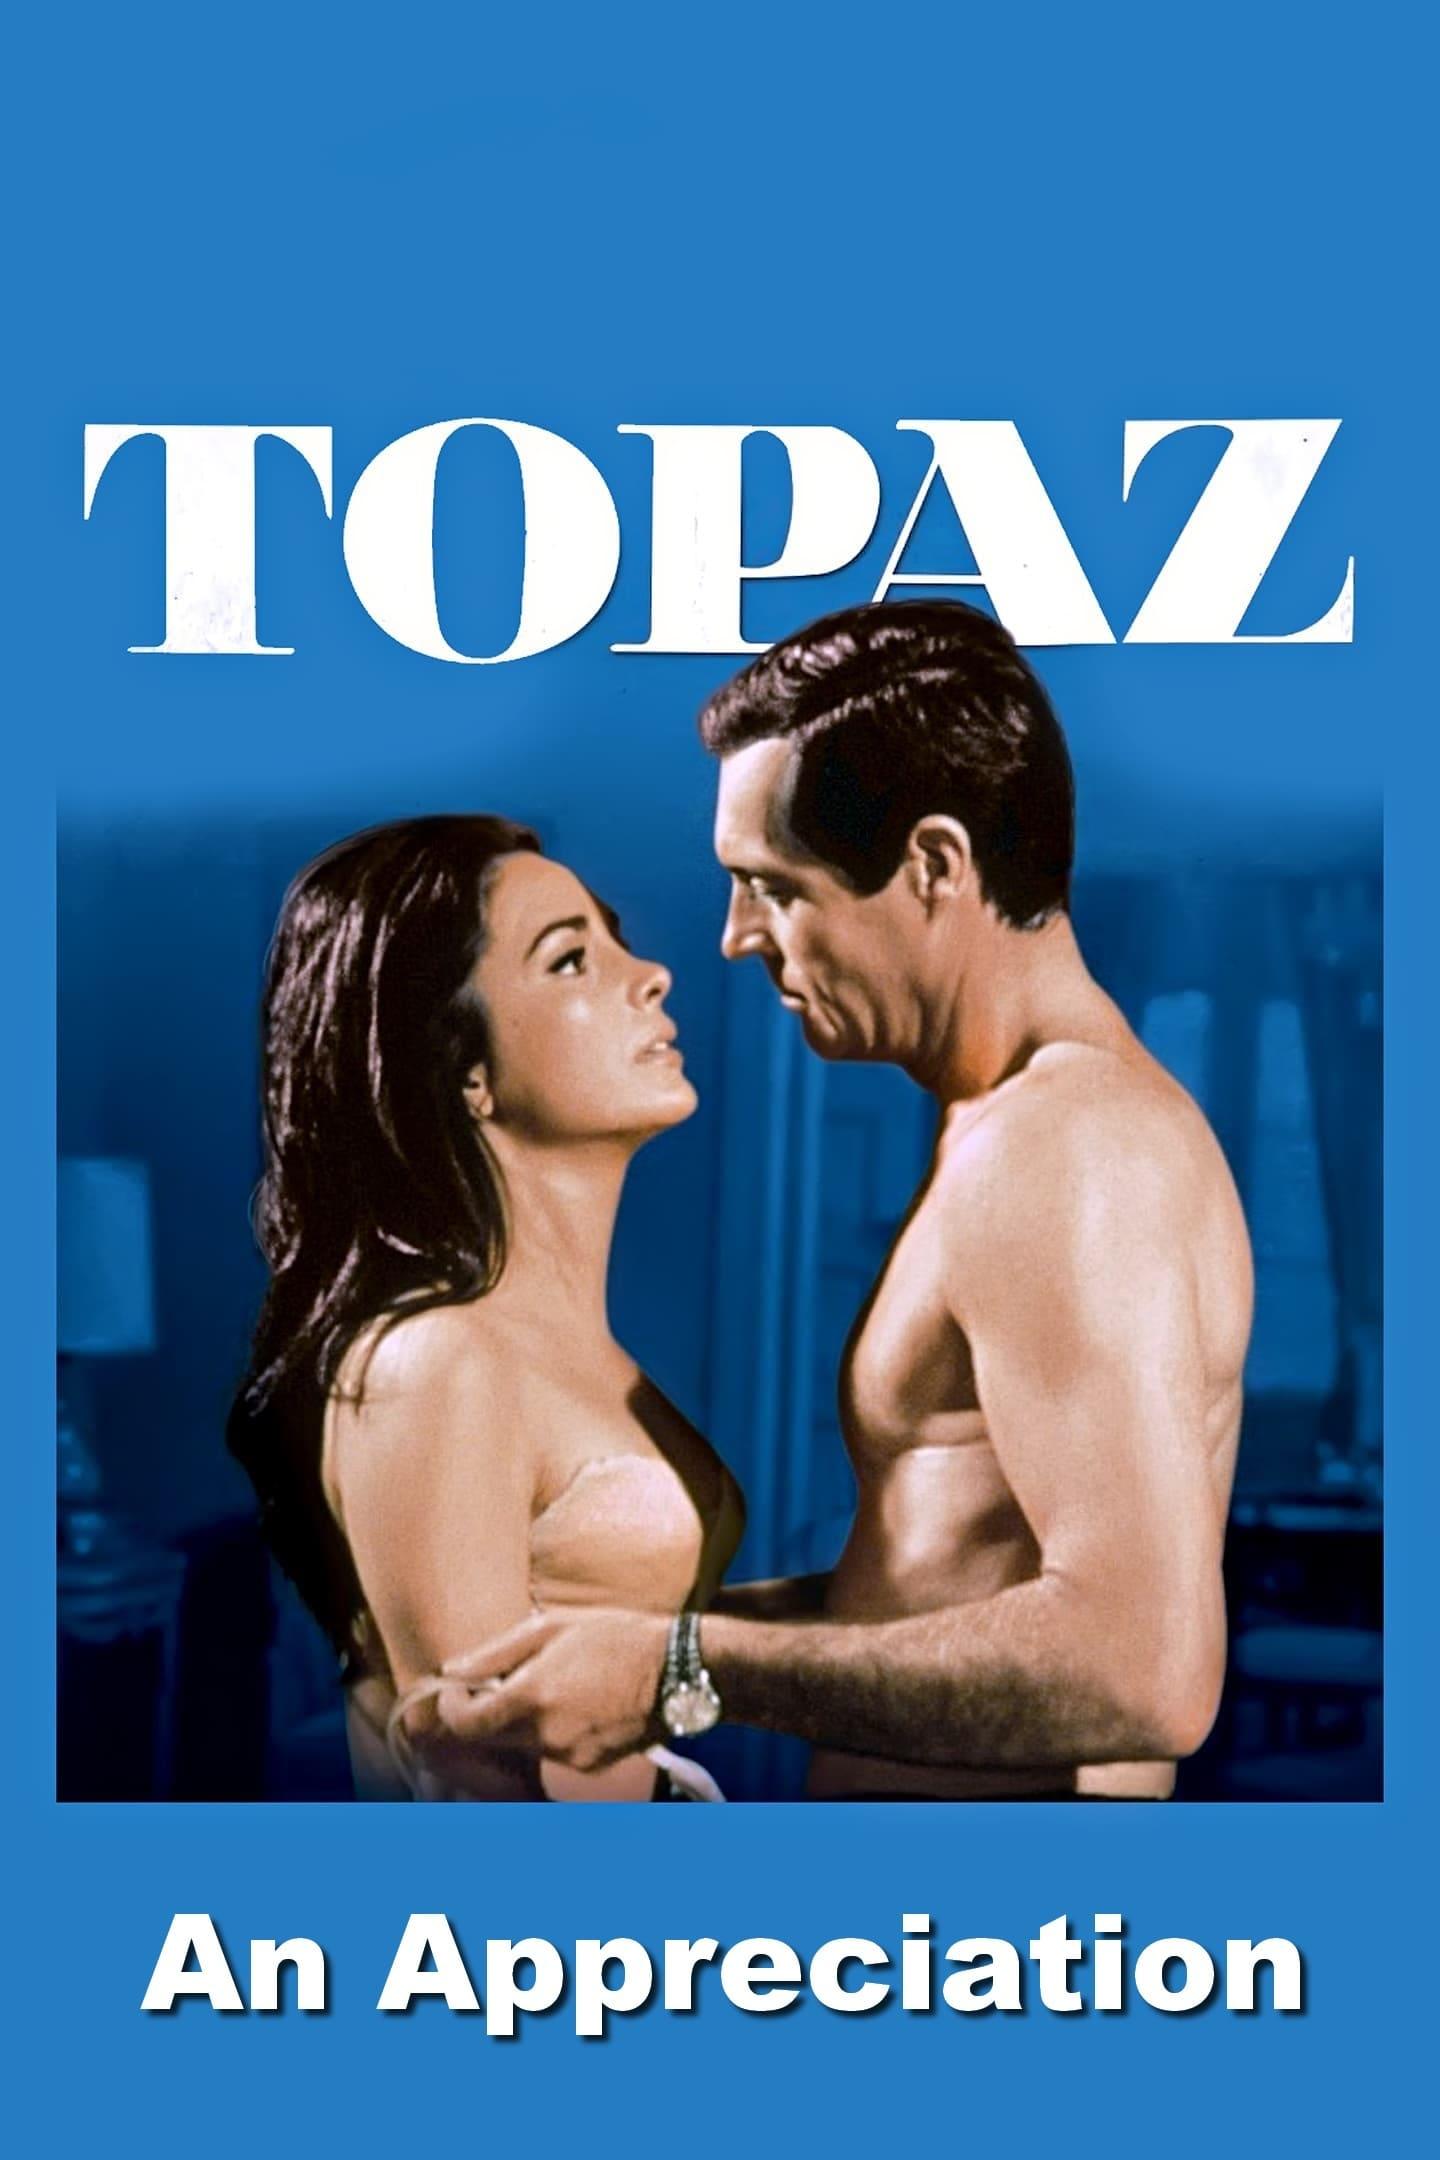 'Topaz': An Appreciation by Film Critic/Historian Leonard Maltin